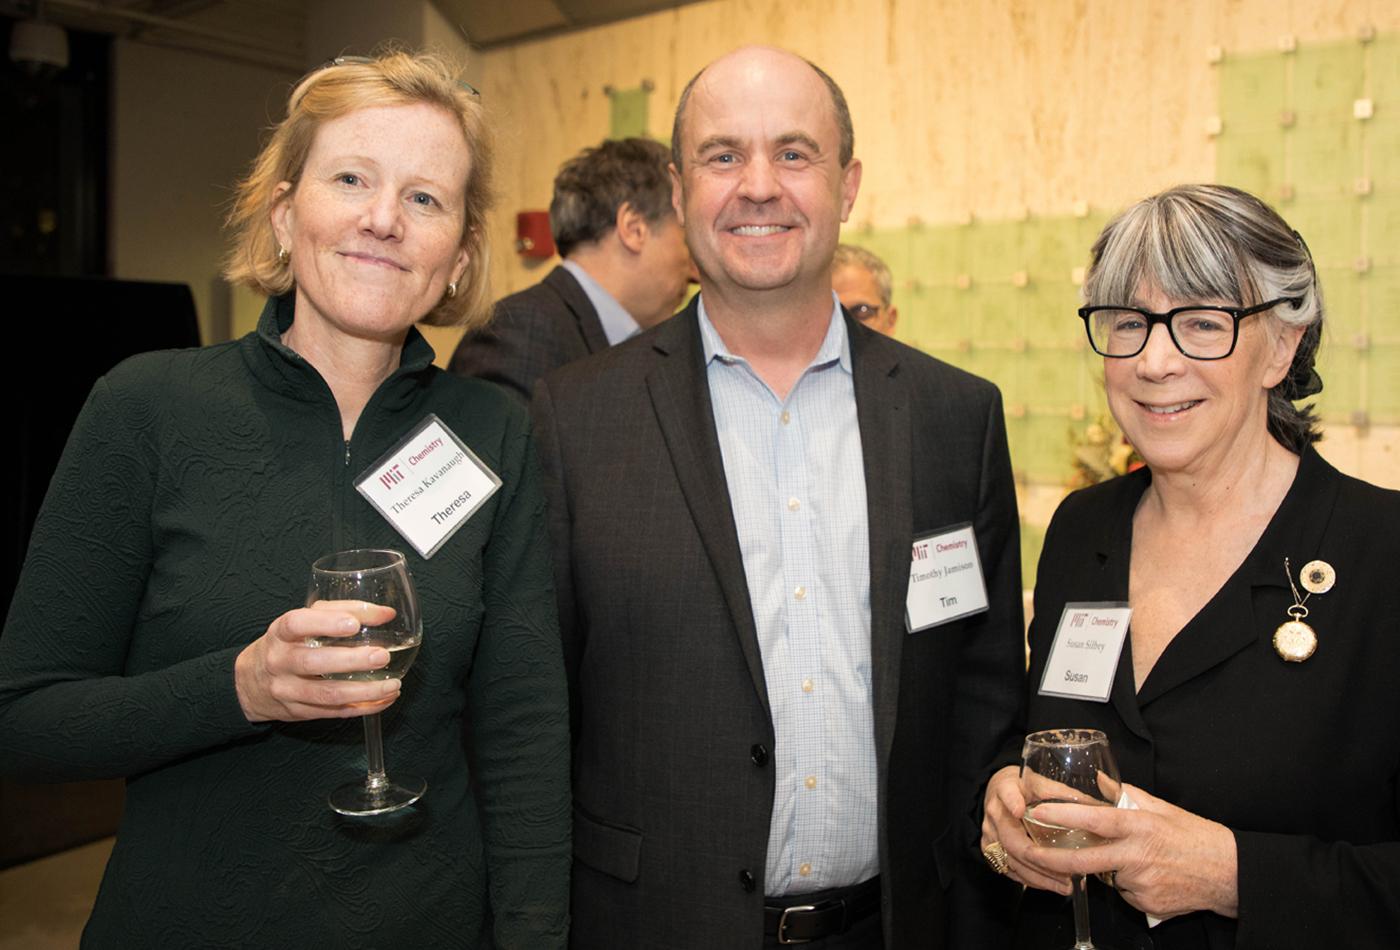 L-R: Theresa Kavanaugh, (PhD 1992, V), Prof. Tim Jamison, Prof. Susan Silbey